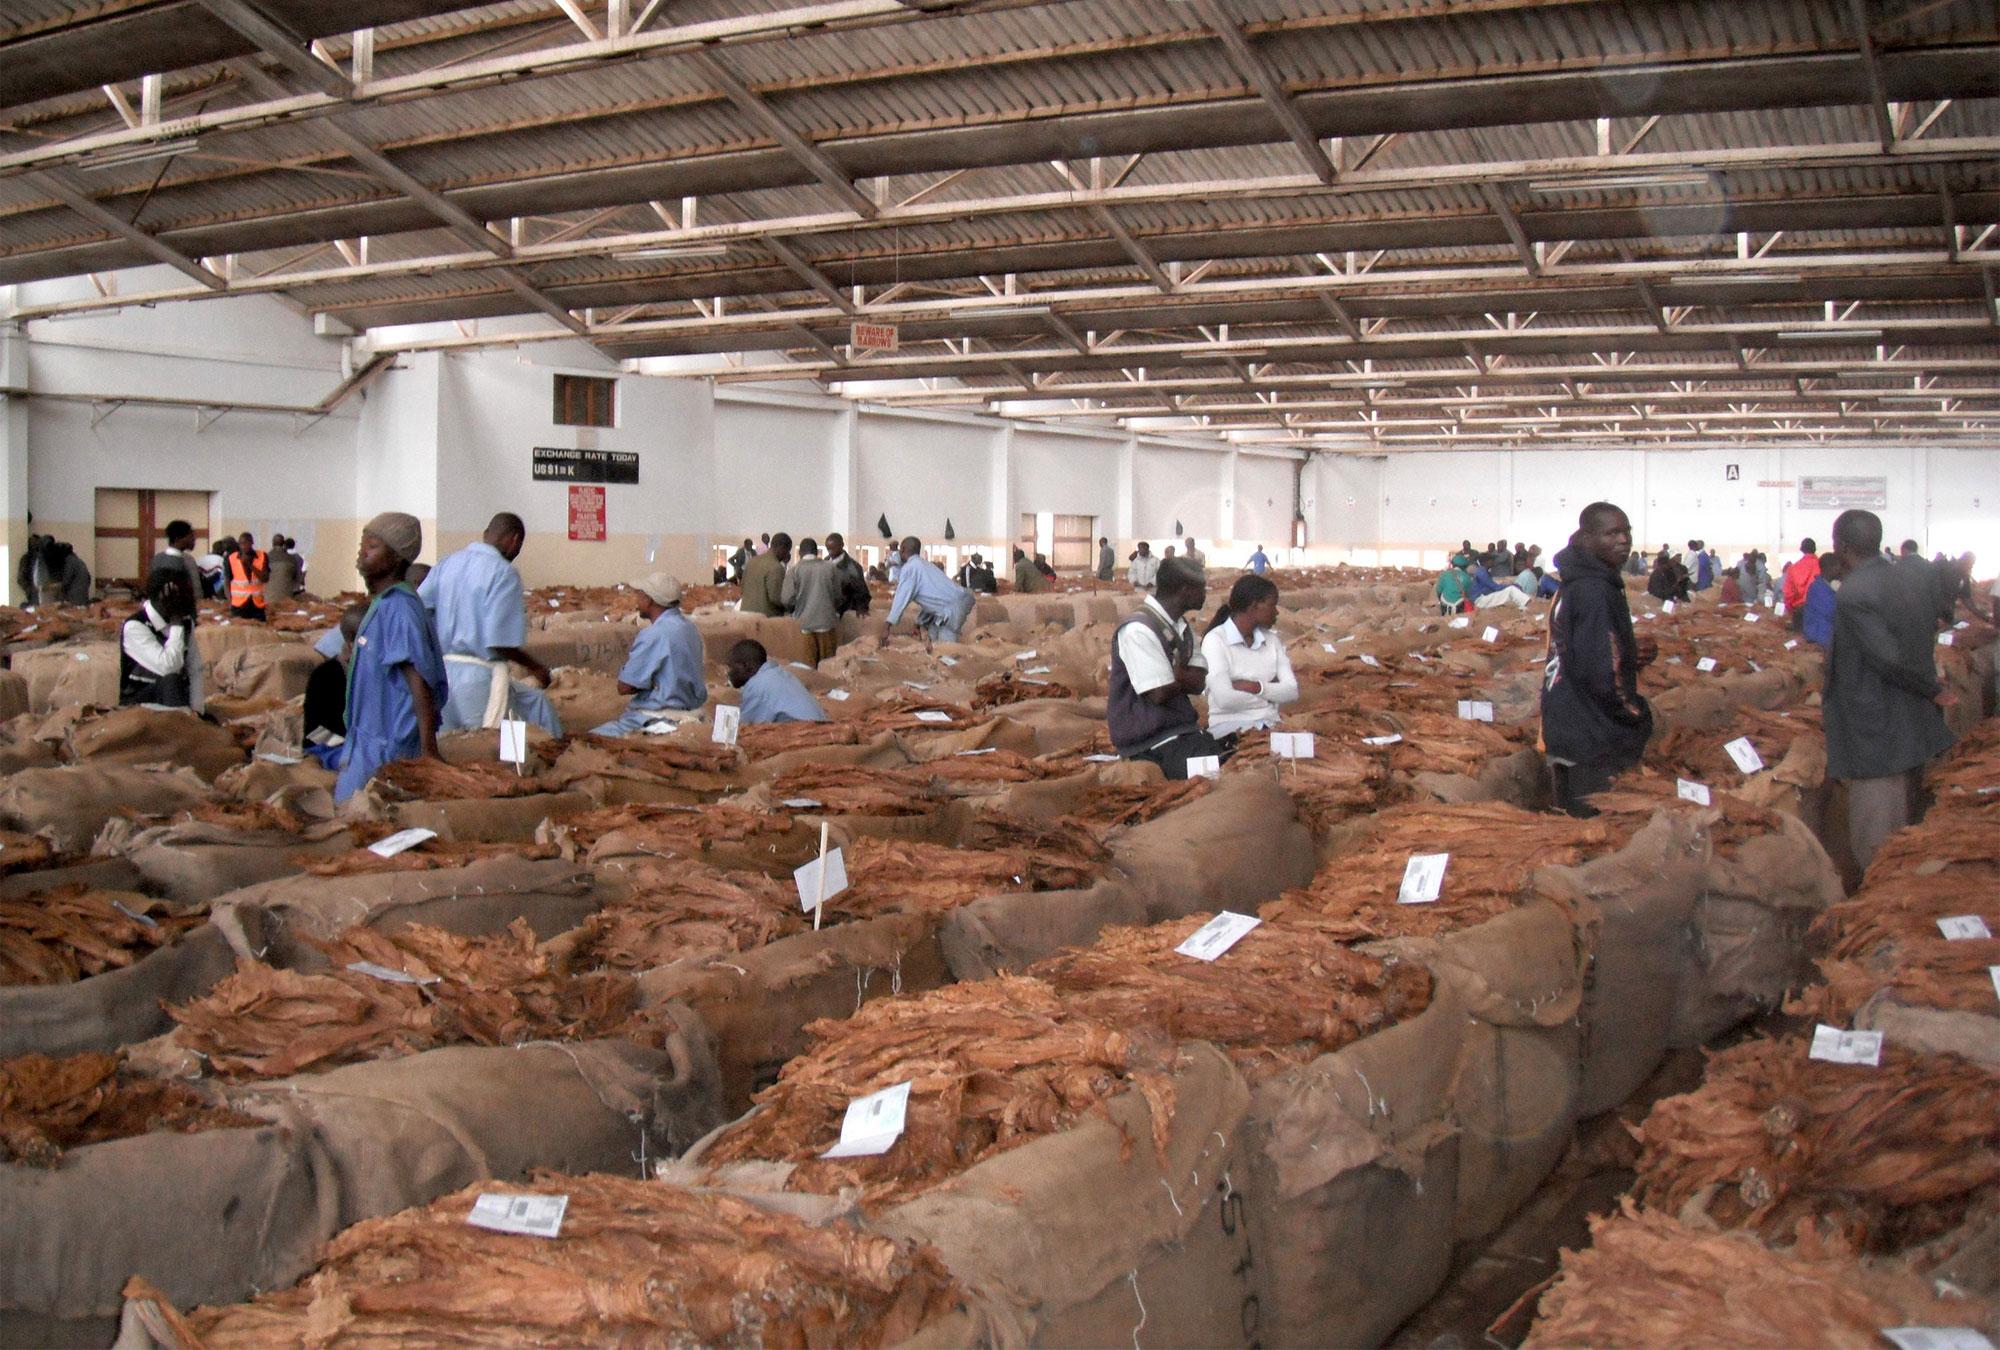 warehouse full of sacks of brown tobacco leaves